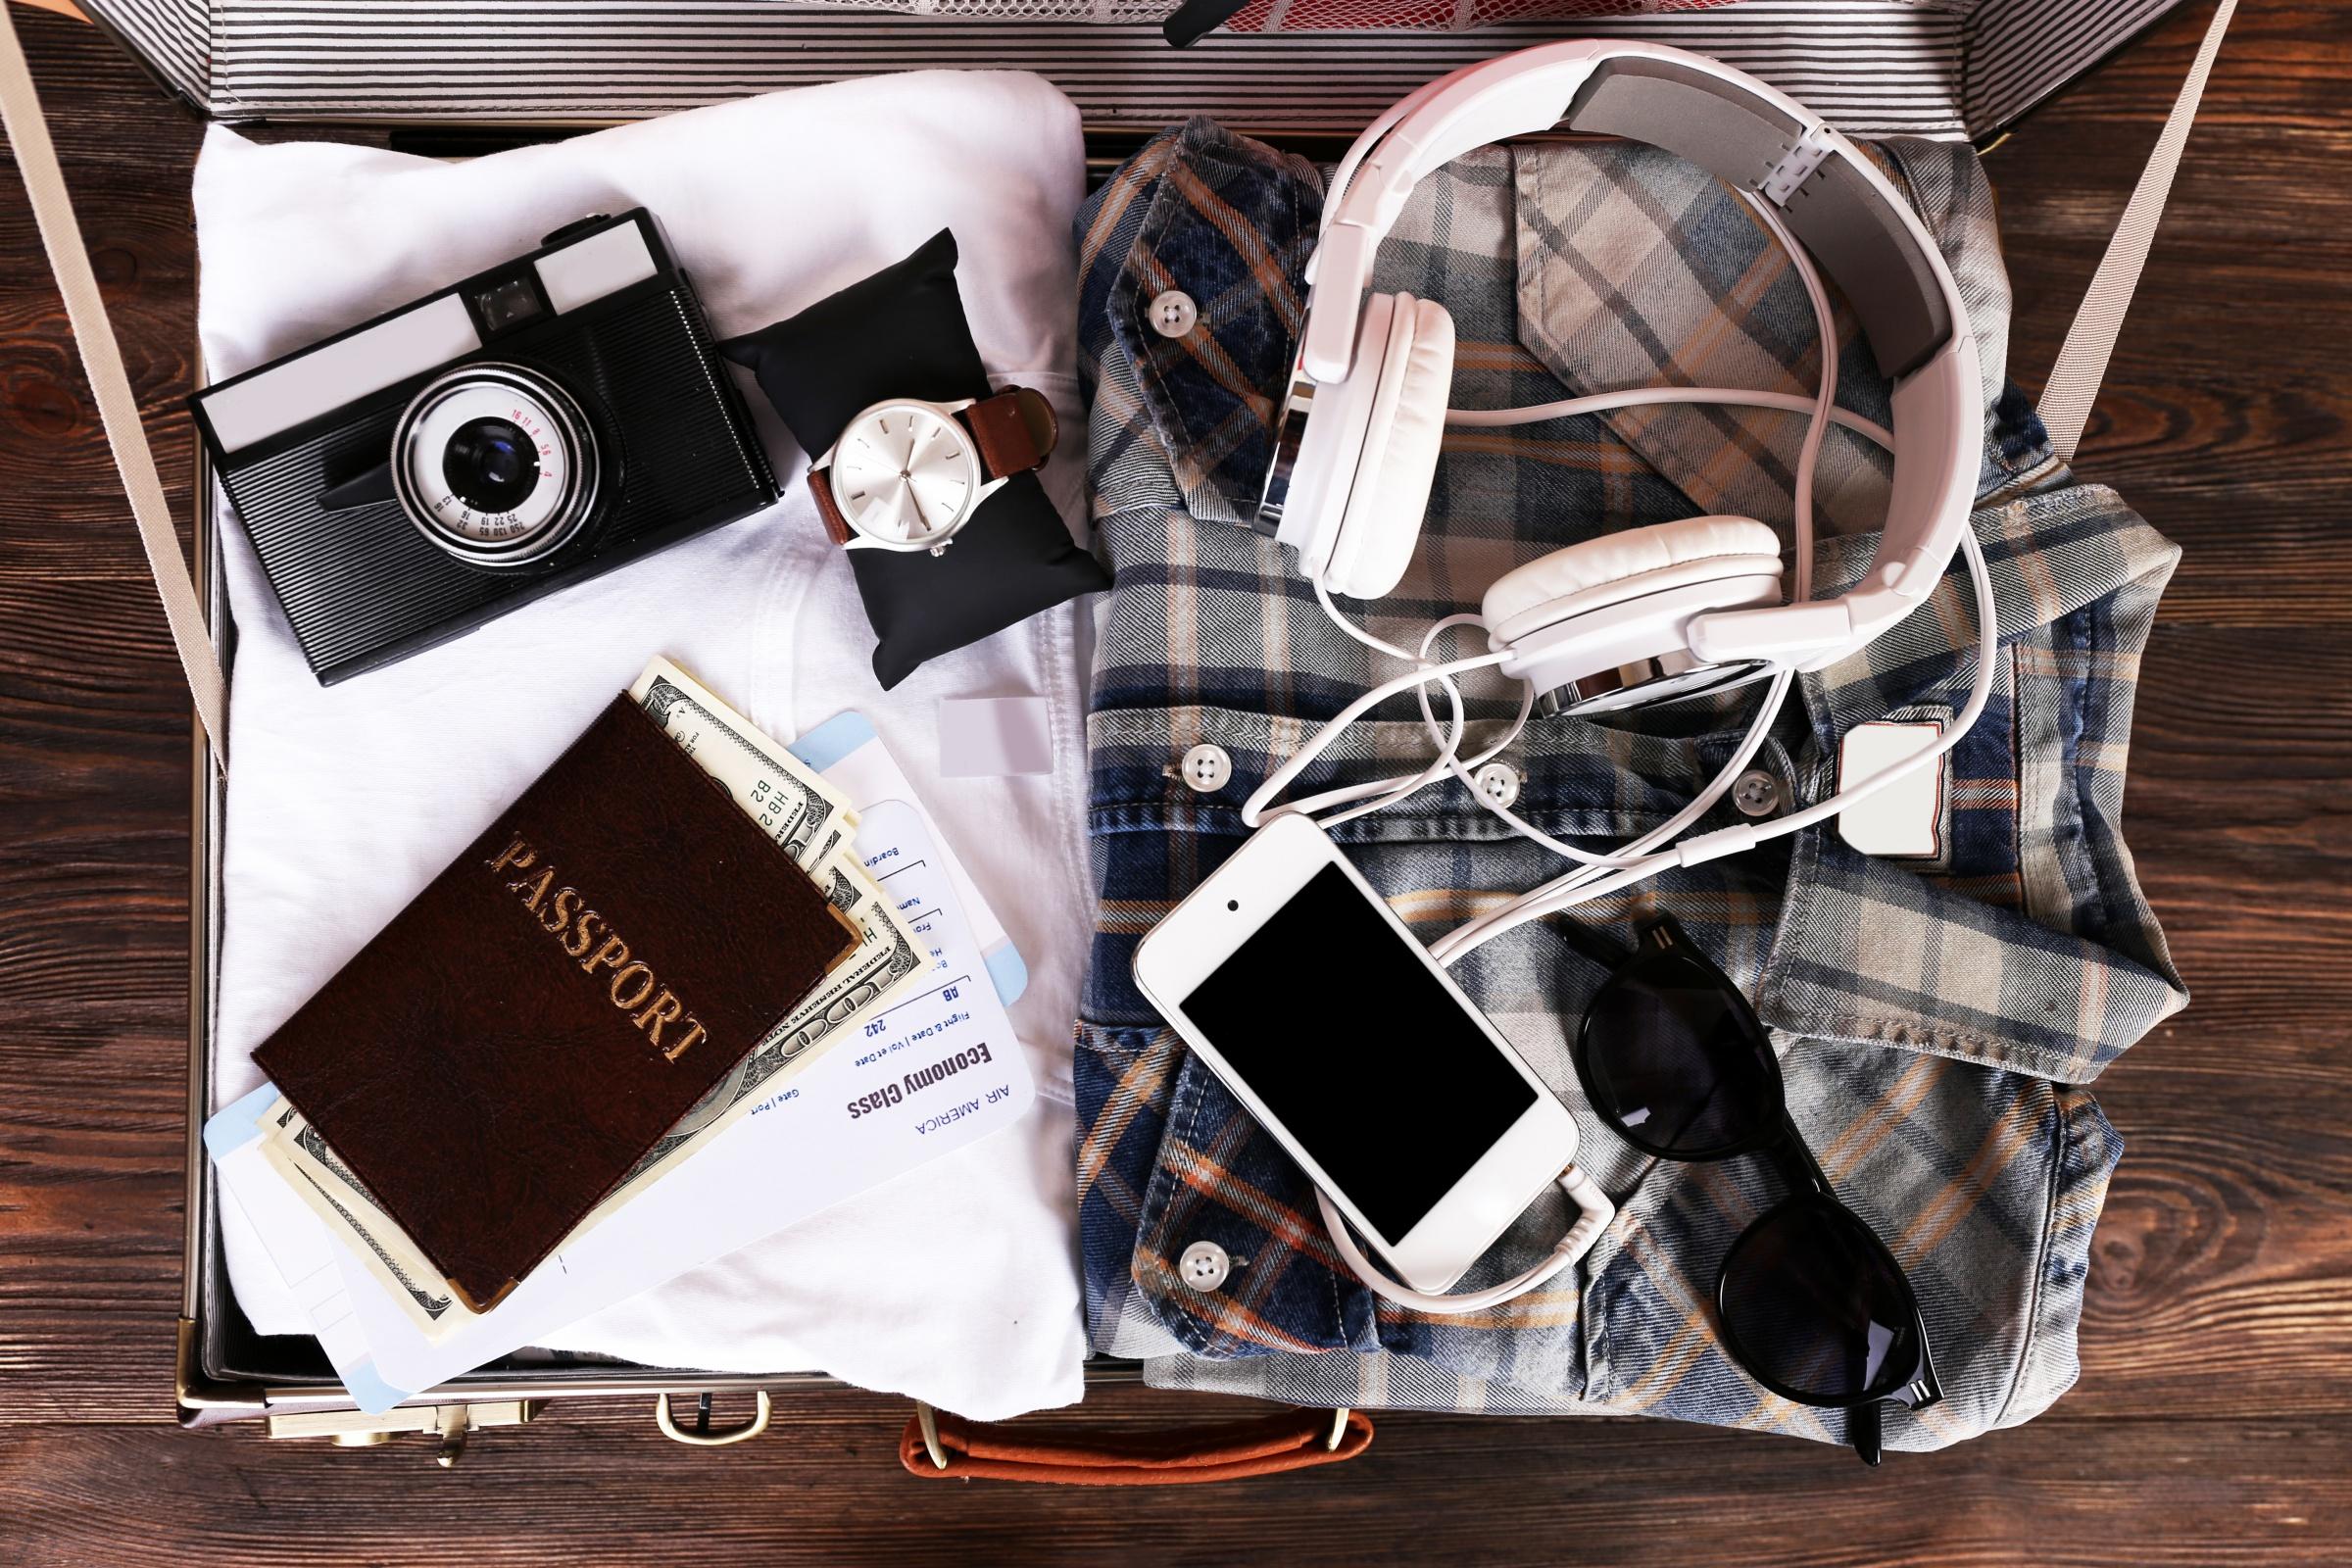 collecion of travel stuff